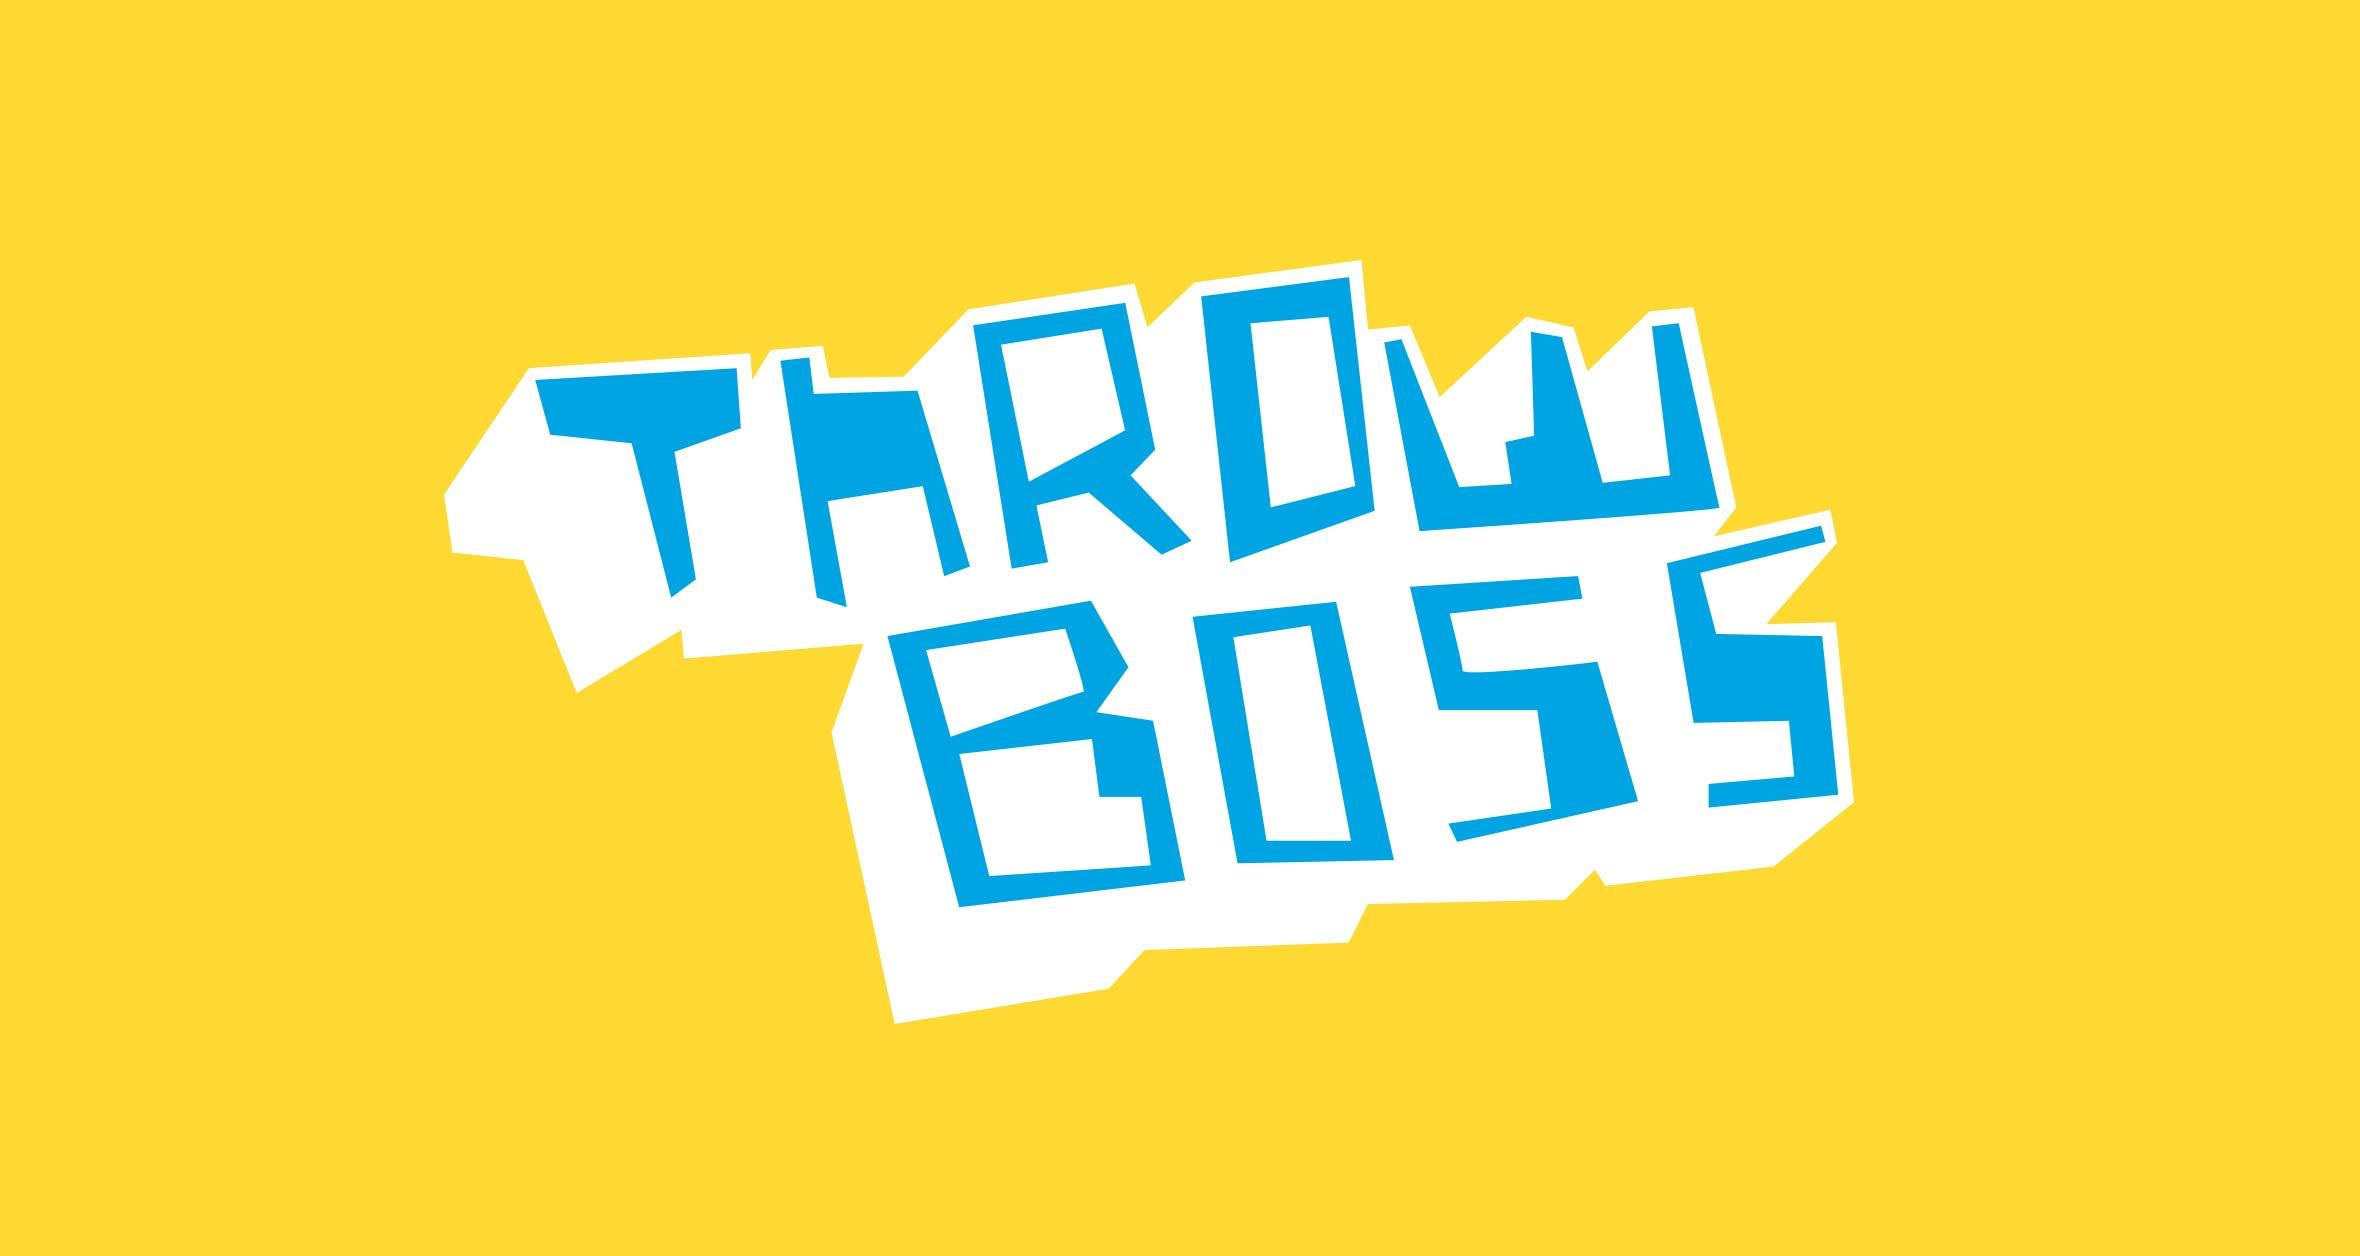 port-throwboss-full-width-2thirds-tall-2